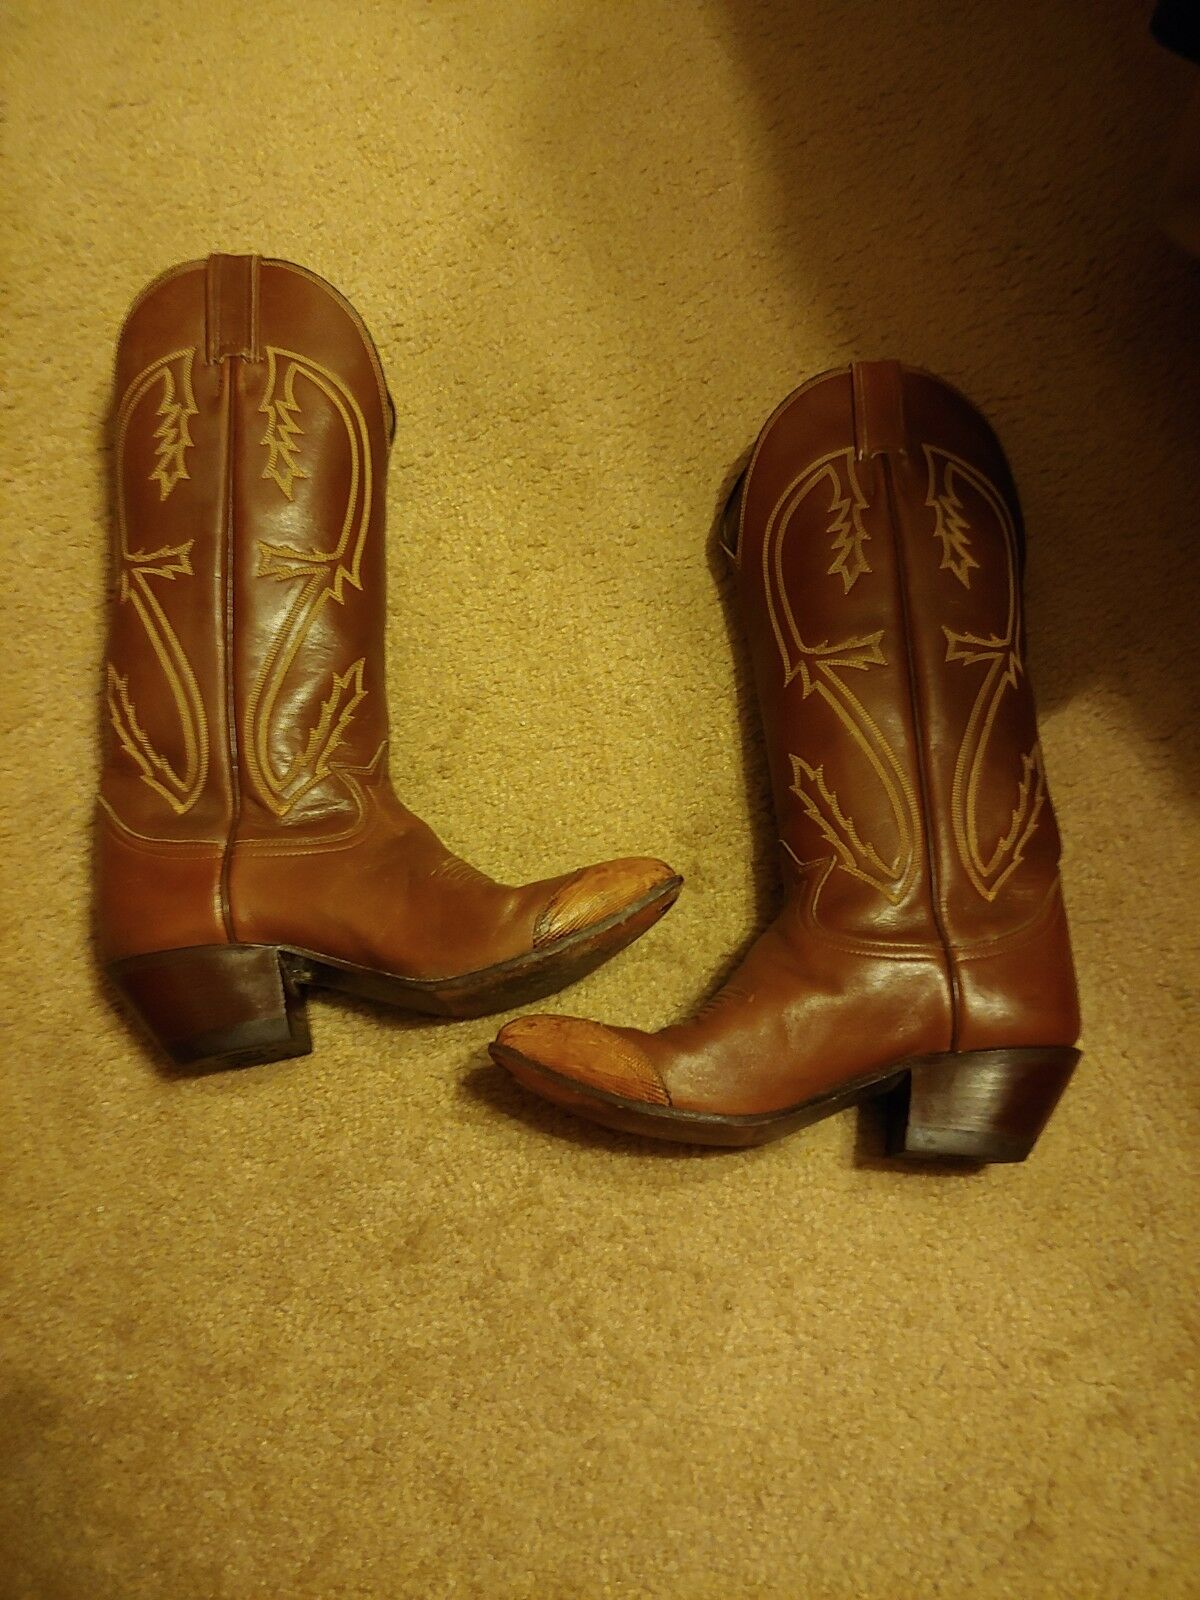 Tony Lama Women's Cowboy Cowboy Cowboy Boots golden Brown Leather Western Size 5 1 2 Beautiful 857876